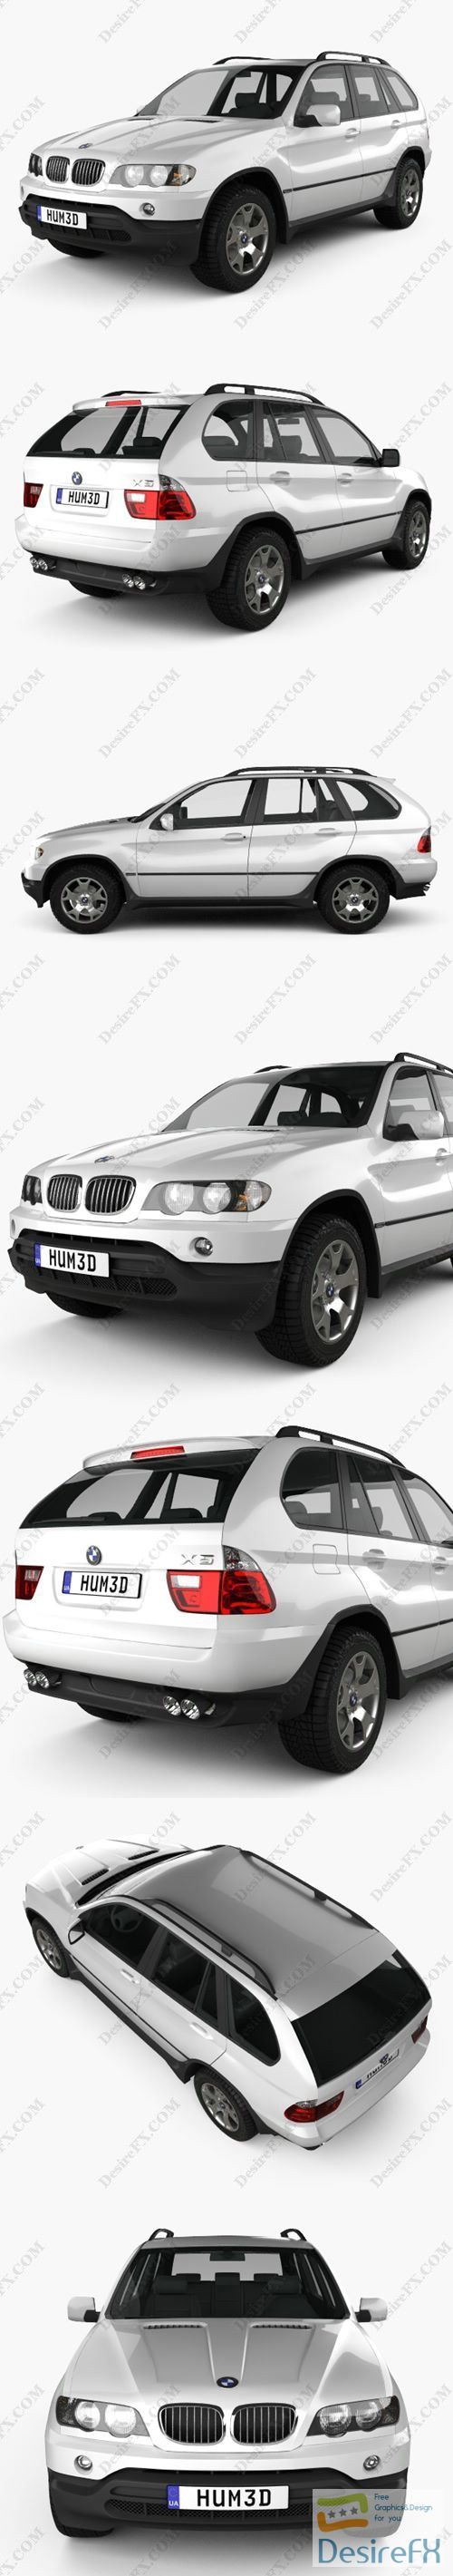 BMW X5 2000 3D Model